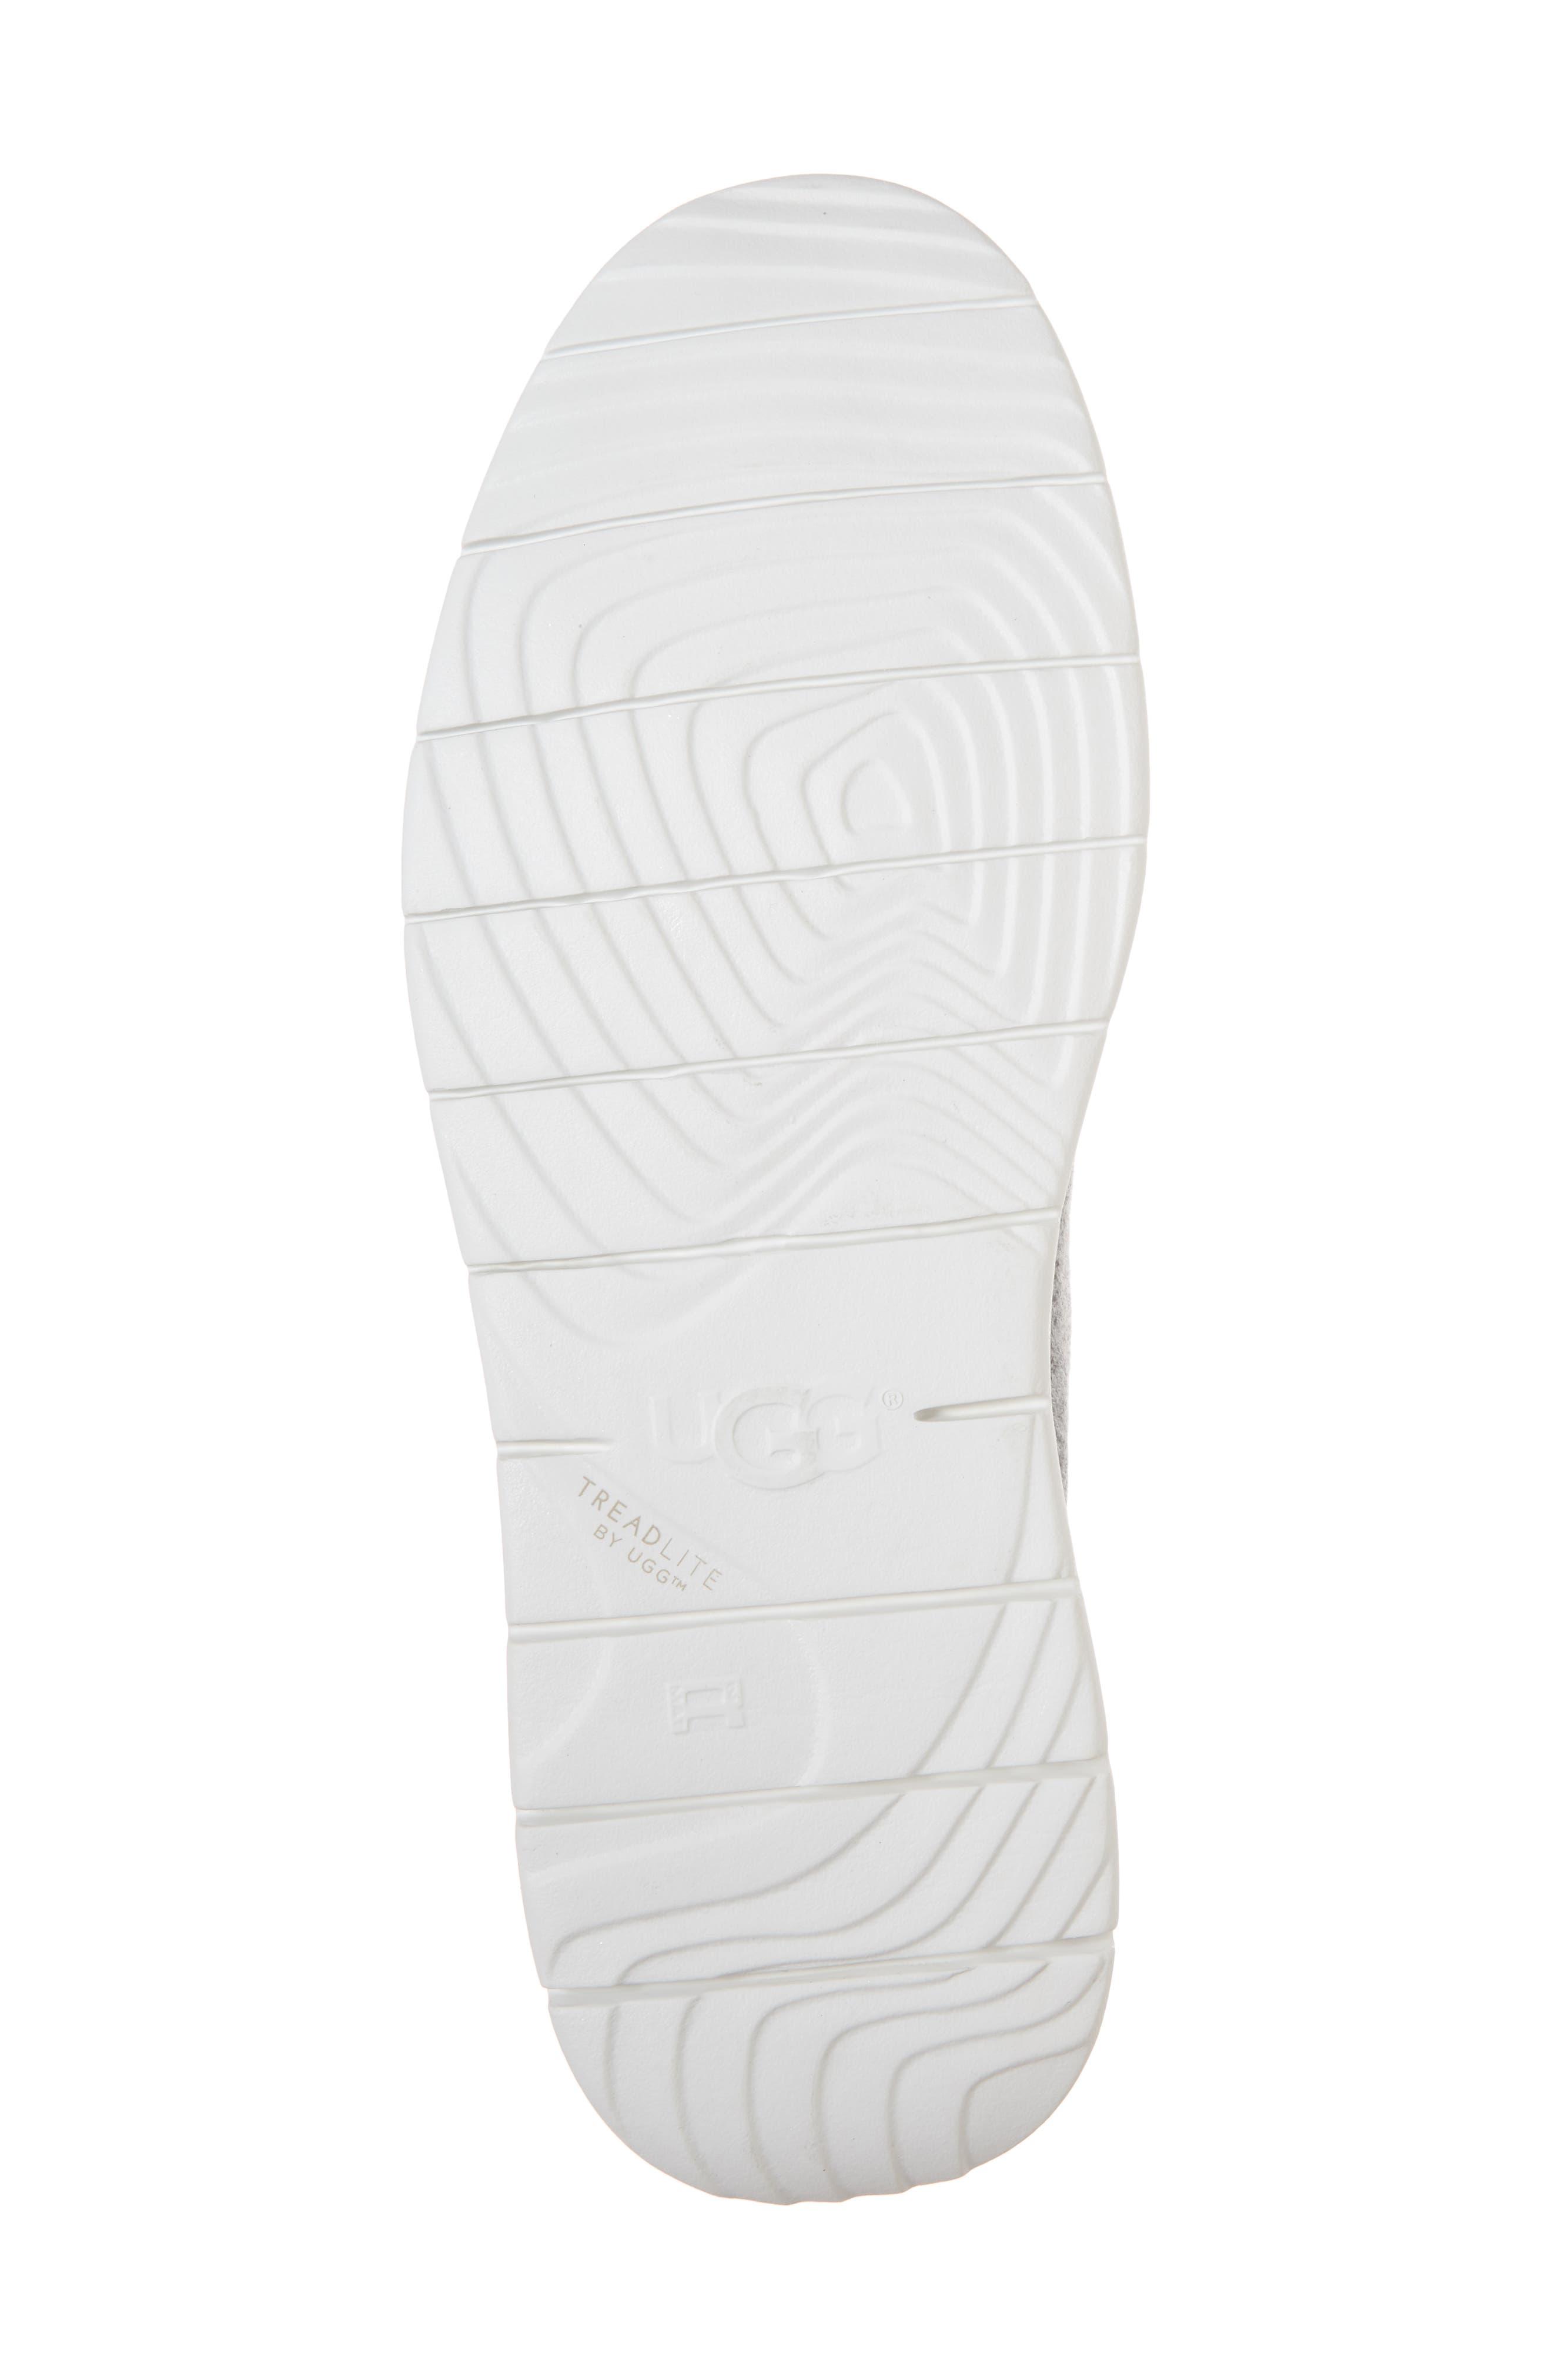 5f210233735 Men'S Feli Hyperweave Knit Lace Up Sneakers in Seal Leather